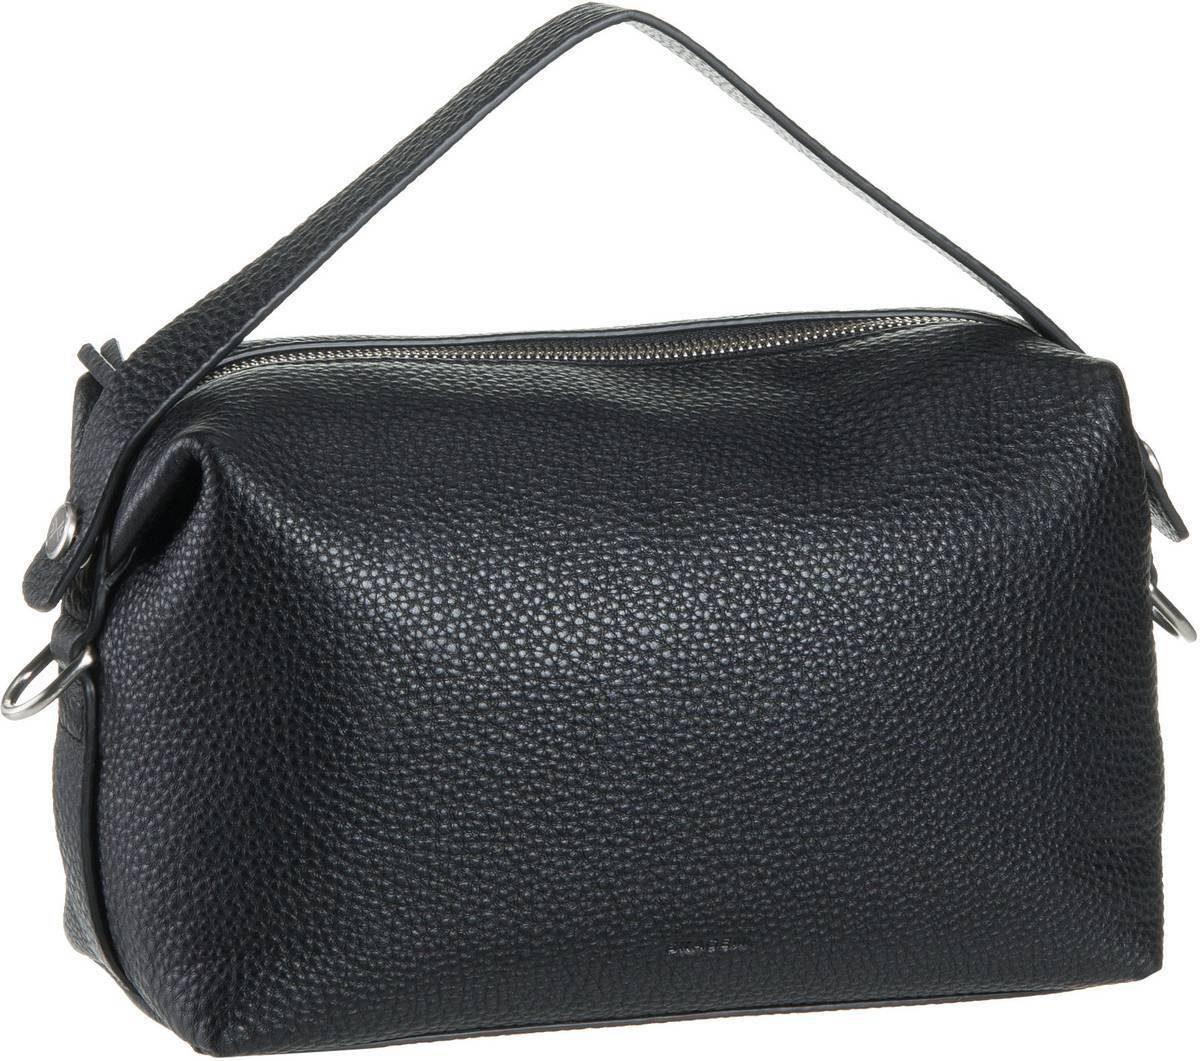 Skagen Handtasche »Ronne Small Satchel«